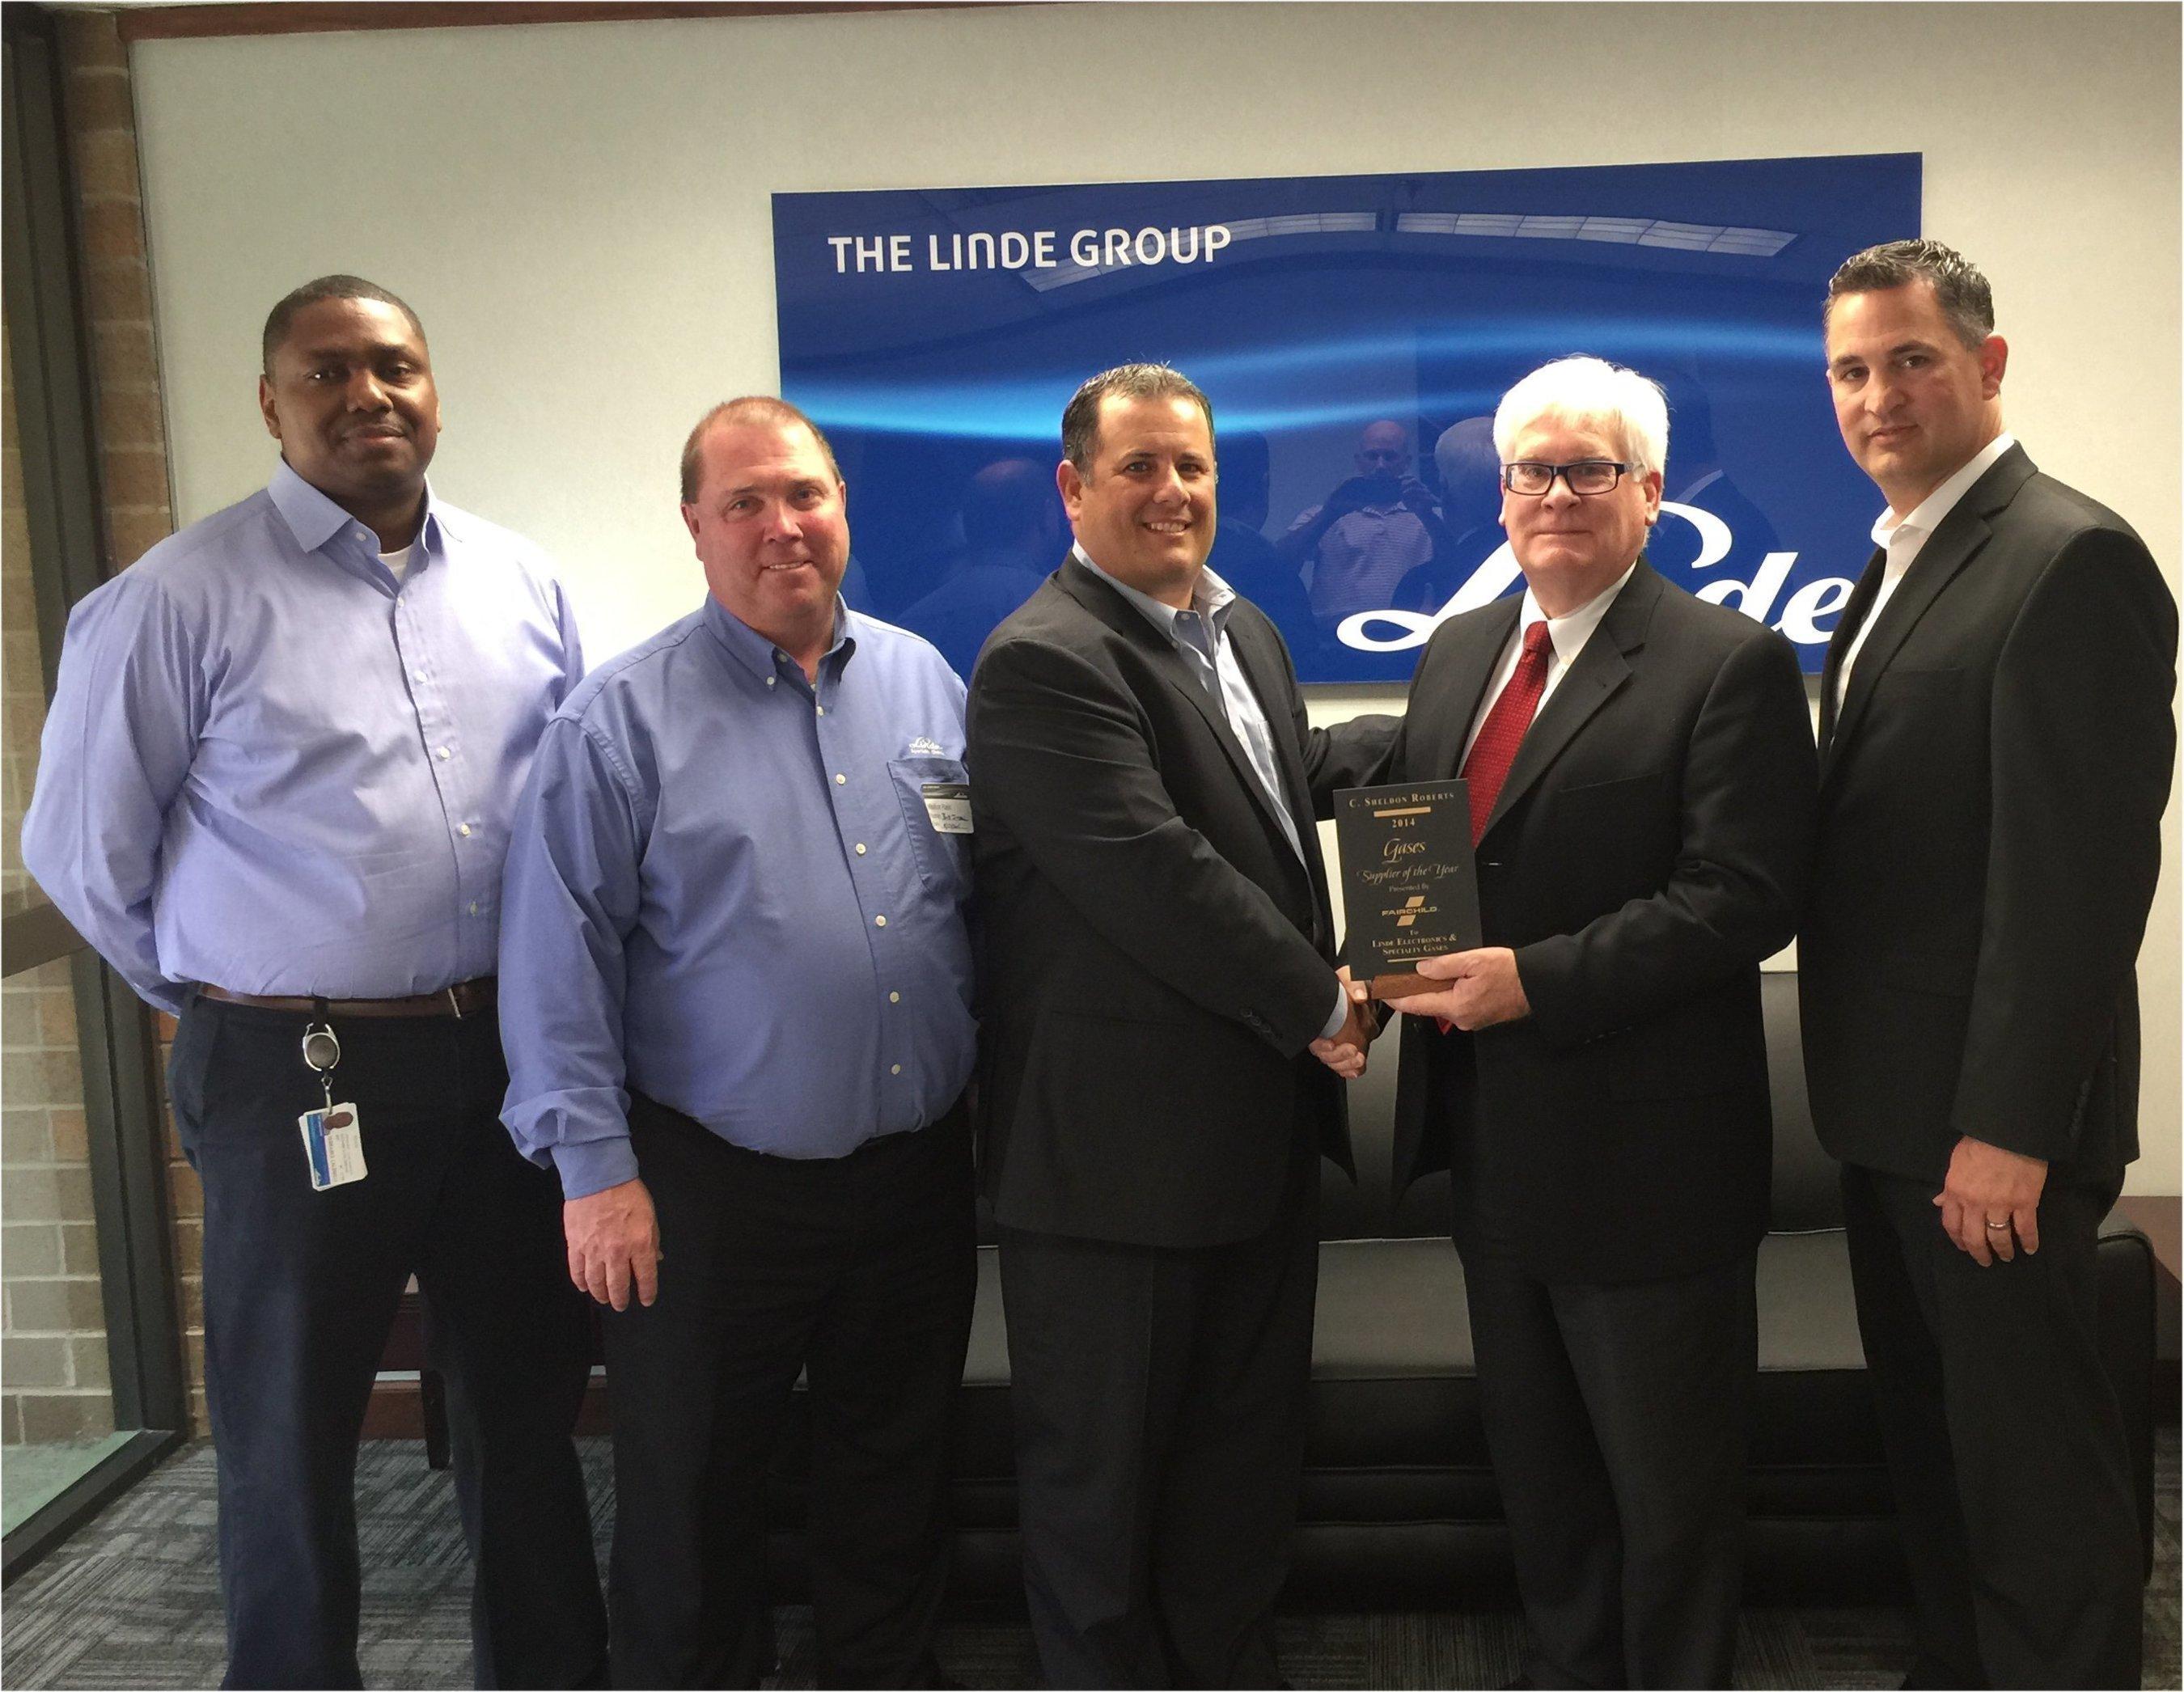 Left to Right: Linde senior executives Terrance Caldwell, Bob Iversen, Rob Capellman, Jay Brennan senior manager from Fairchild Semiconductor Corporation and Matt Adams (Linde).